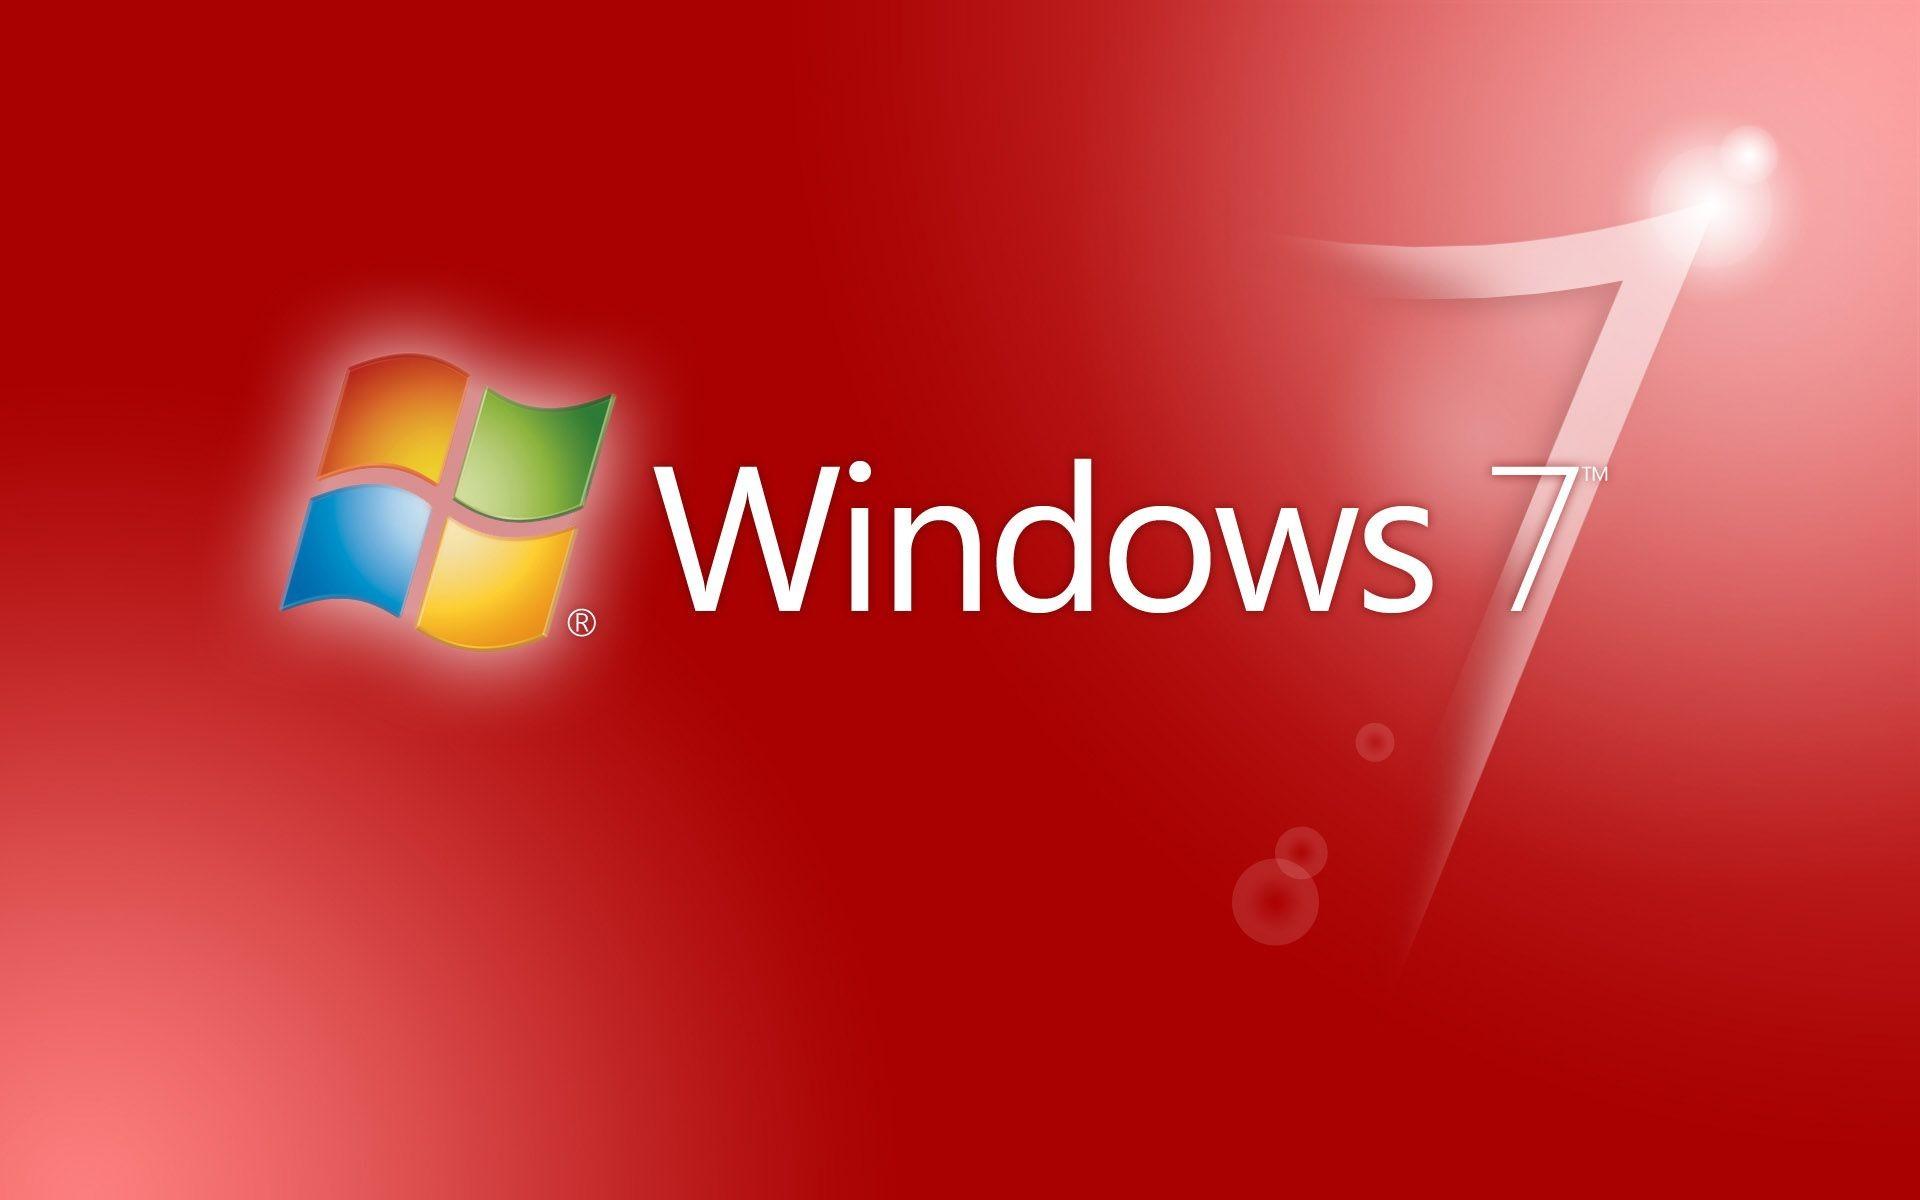 Windows Server Wallpaper 1440×900 Windows Server Wallpapers (31 Wallpapers)  | Adorable Wallpapers